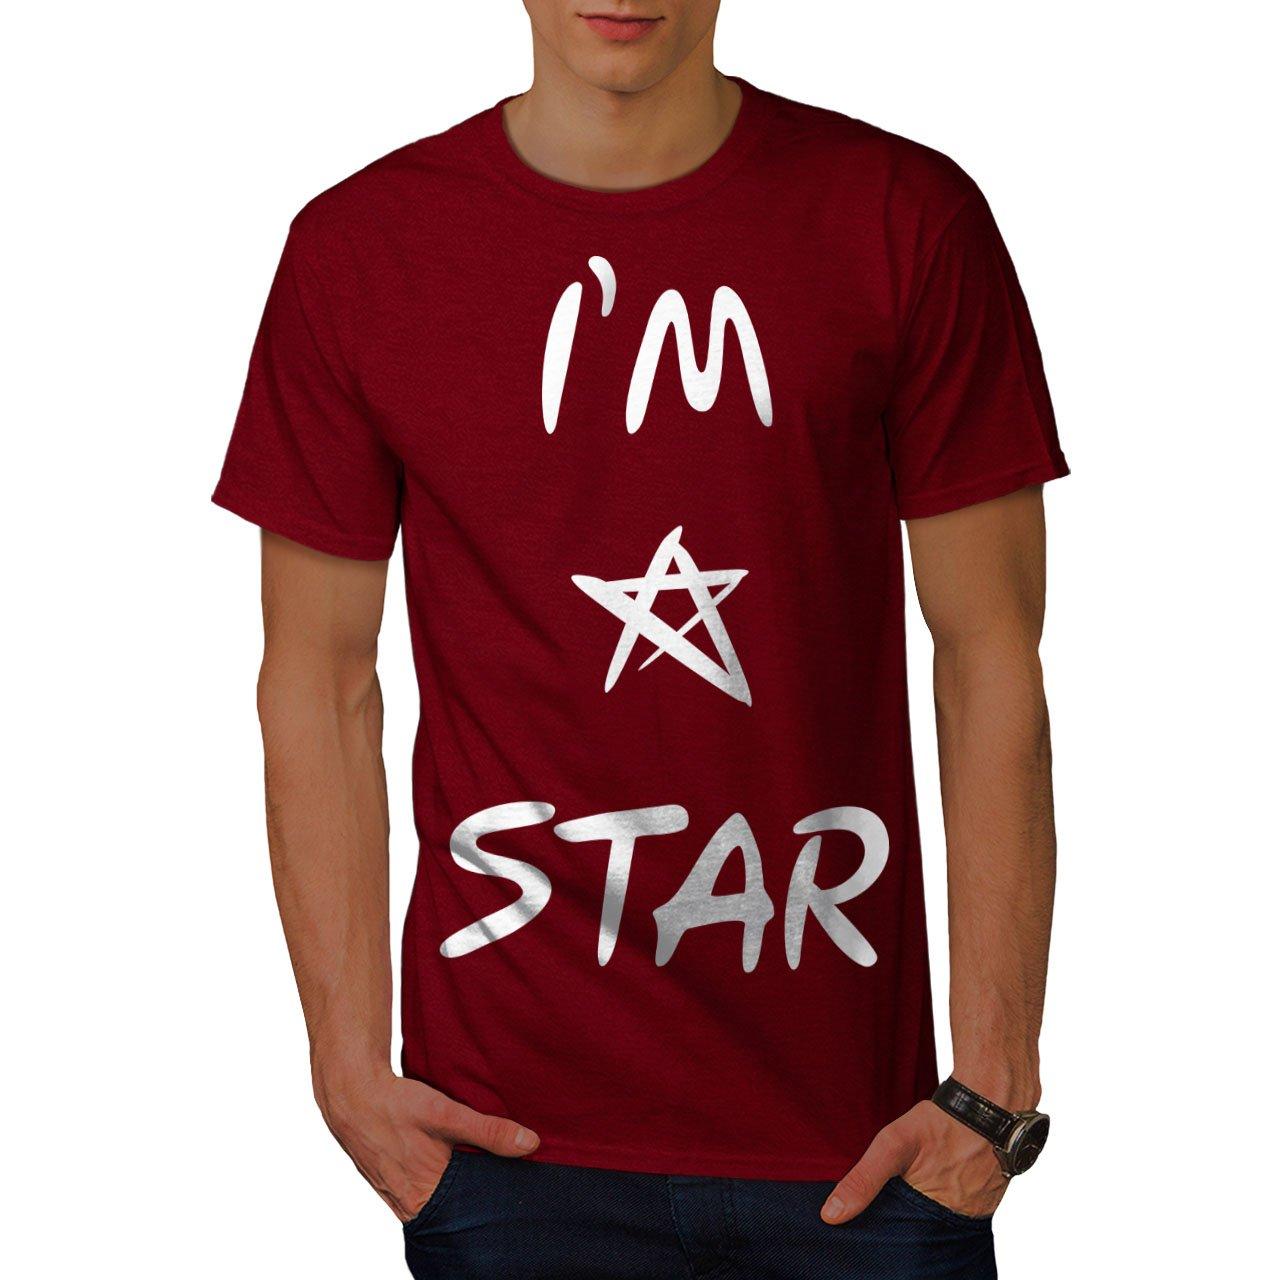 Famous Graphic T Shirt Designers - DREAMWORKS